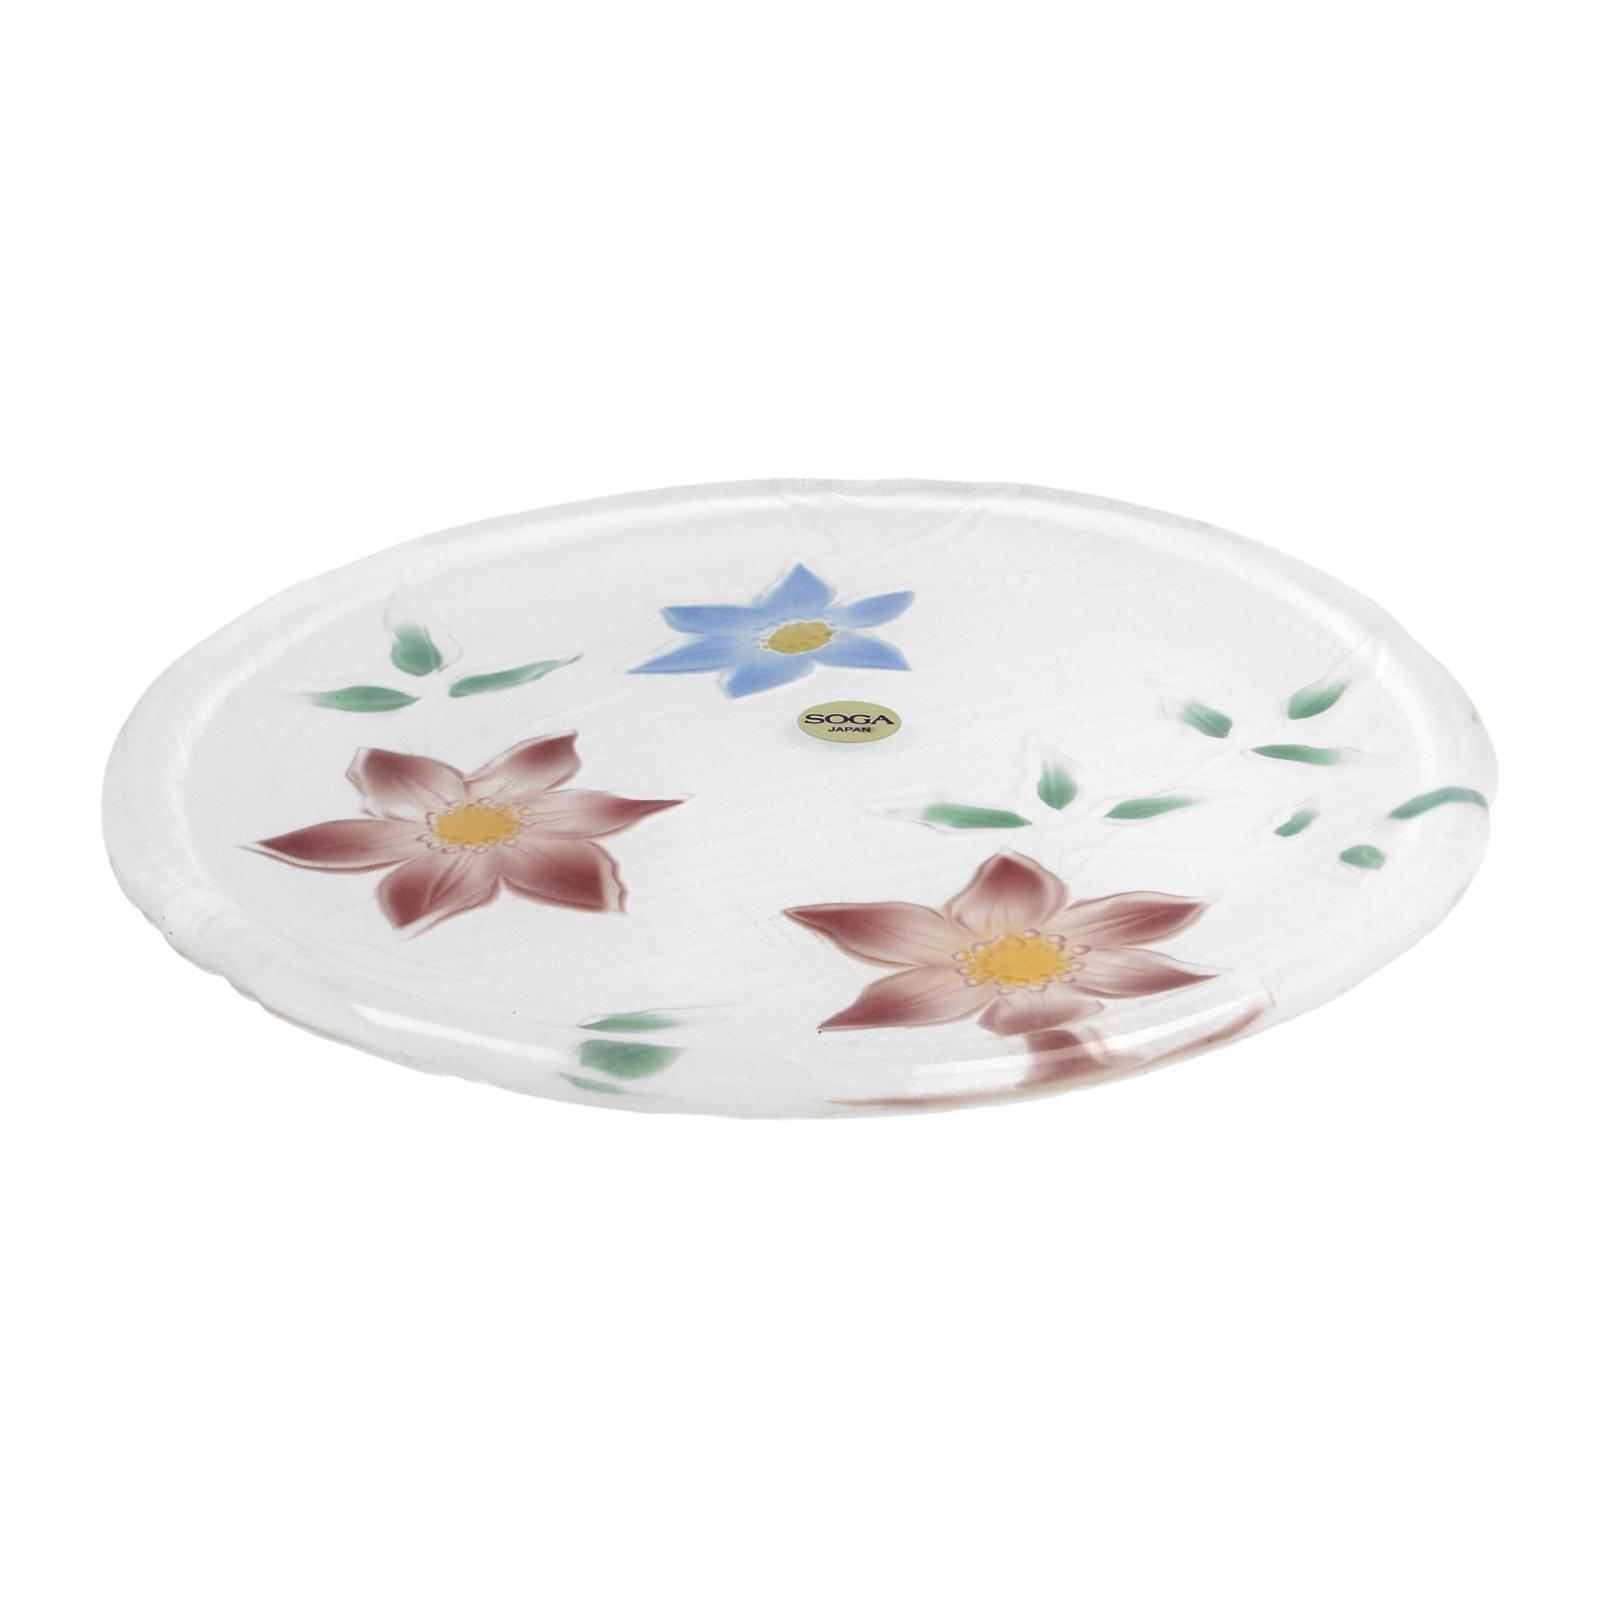 Soga Okusaga Glass Plate 9